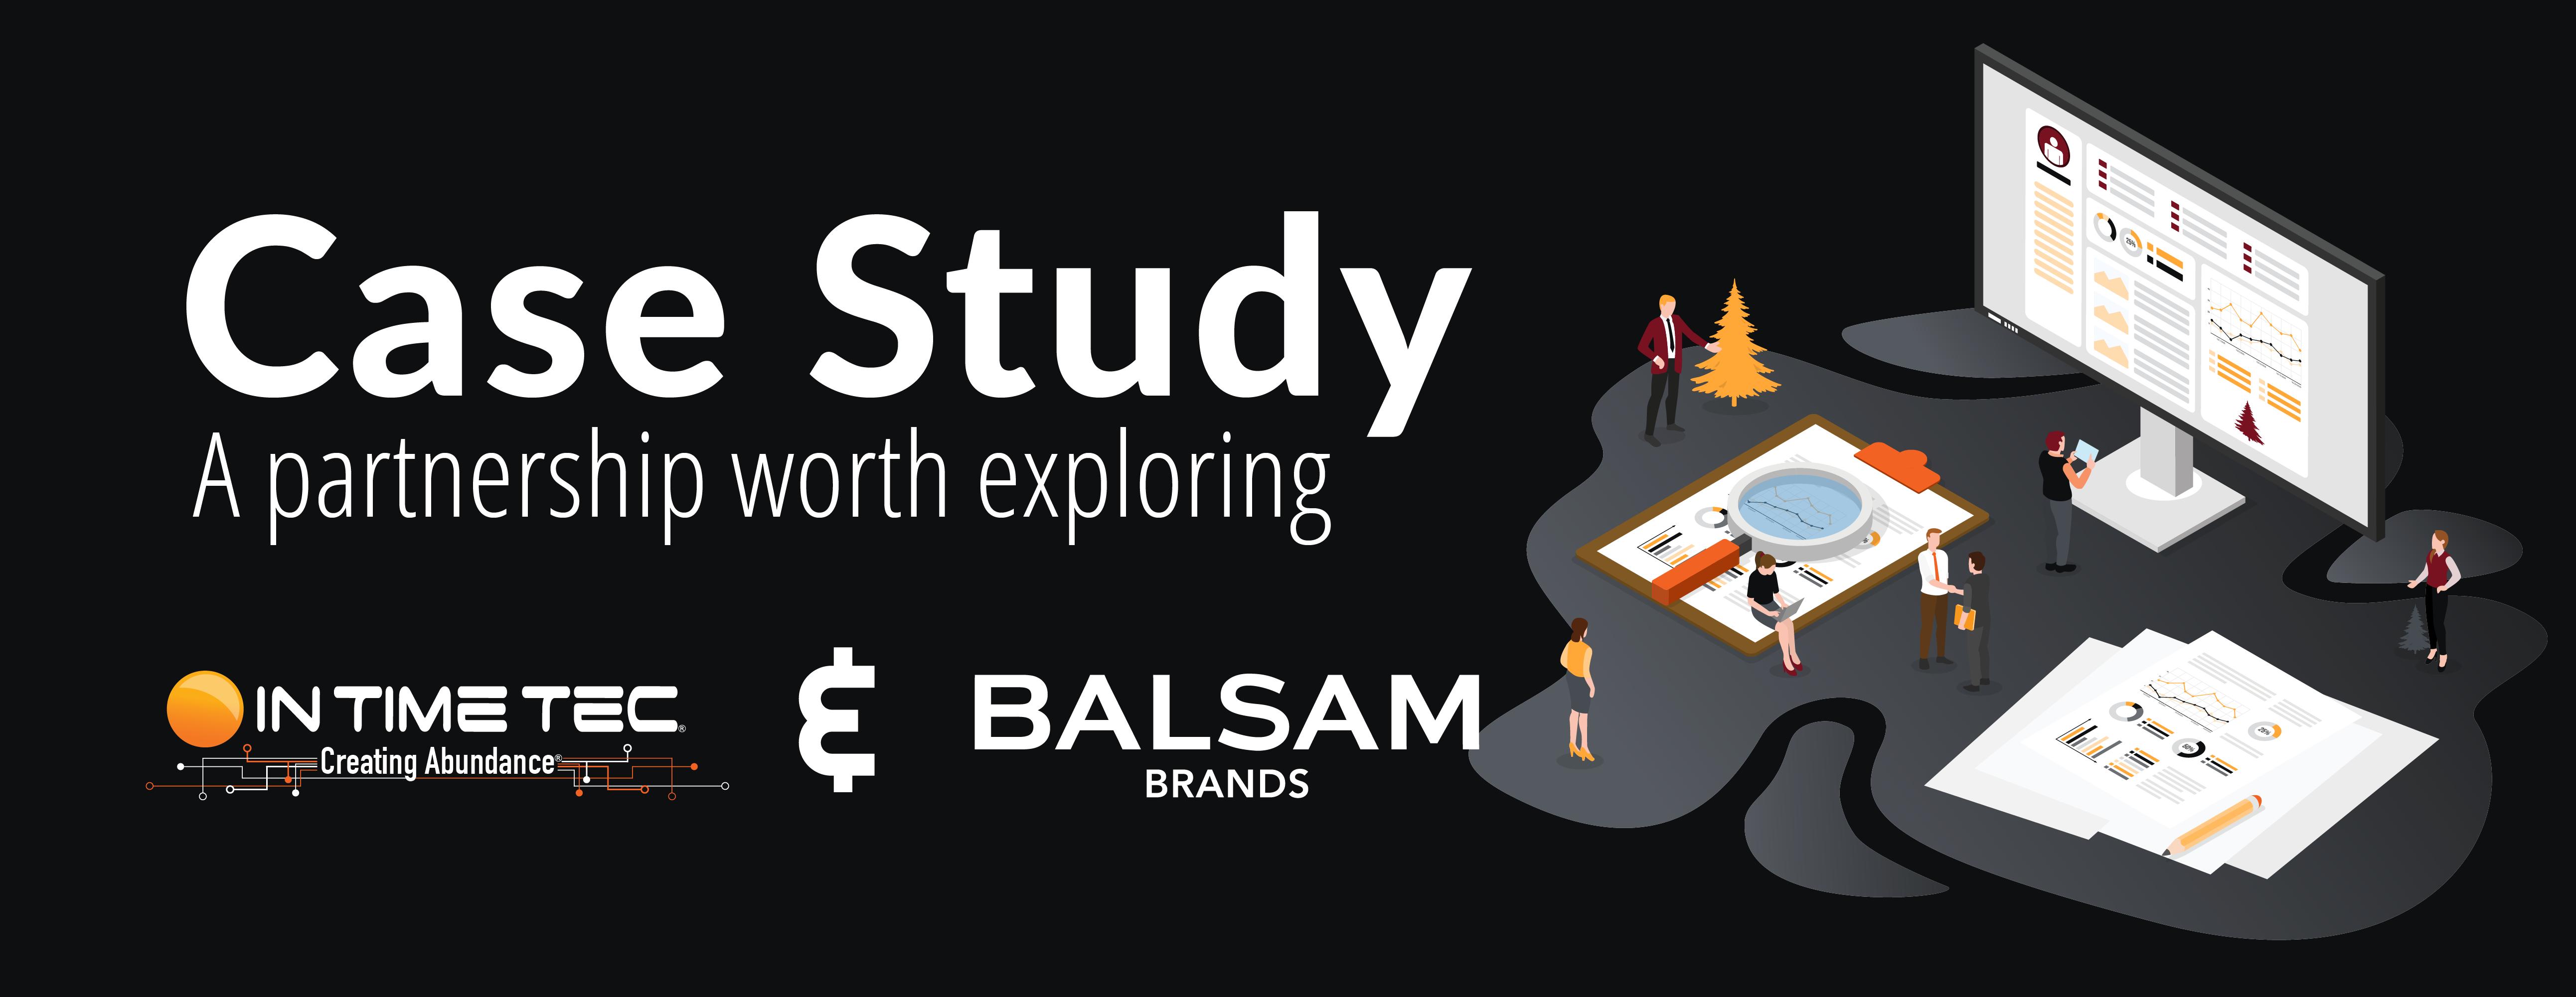 BalsamCase Study Banner2test